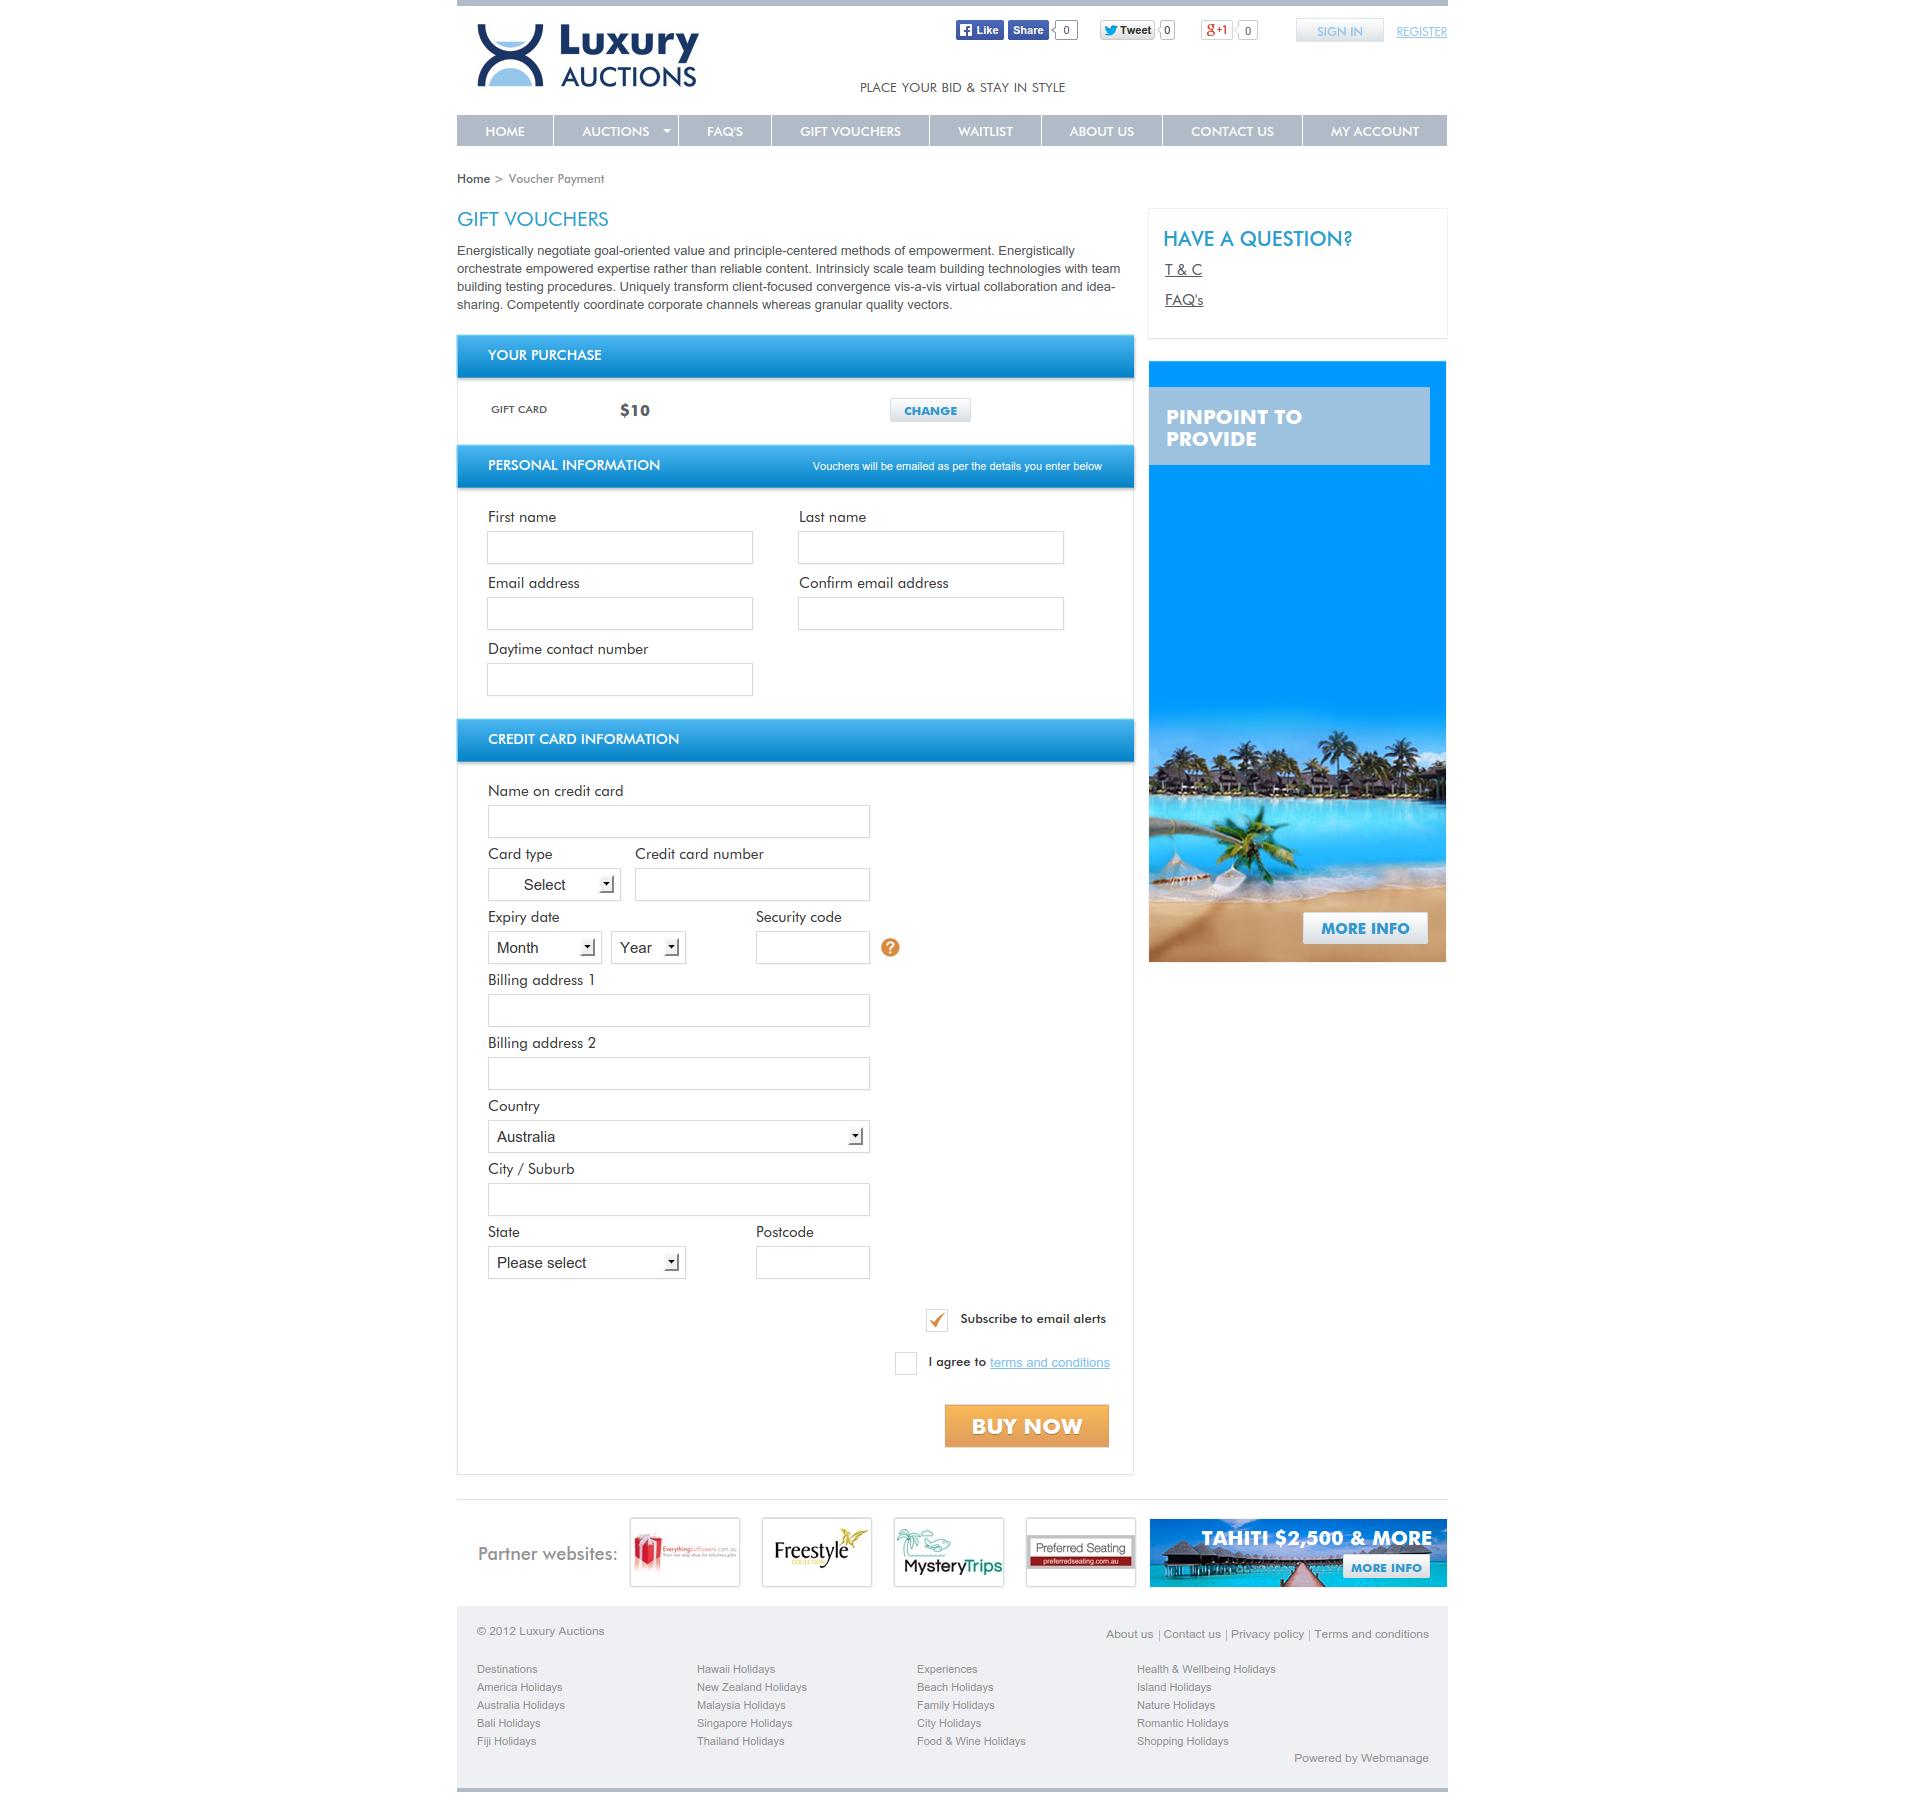 Luxury Travel Auction - Voucher Purchase